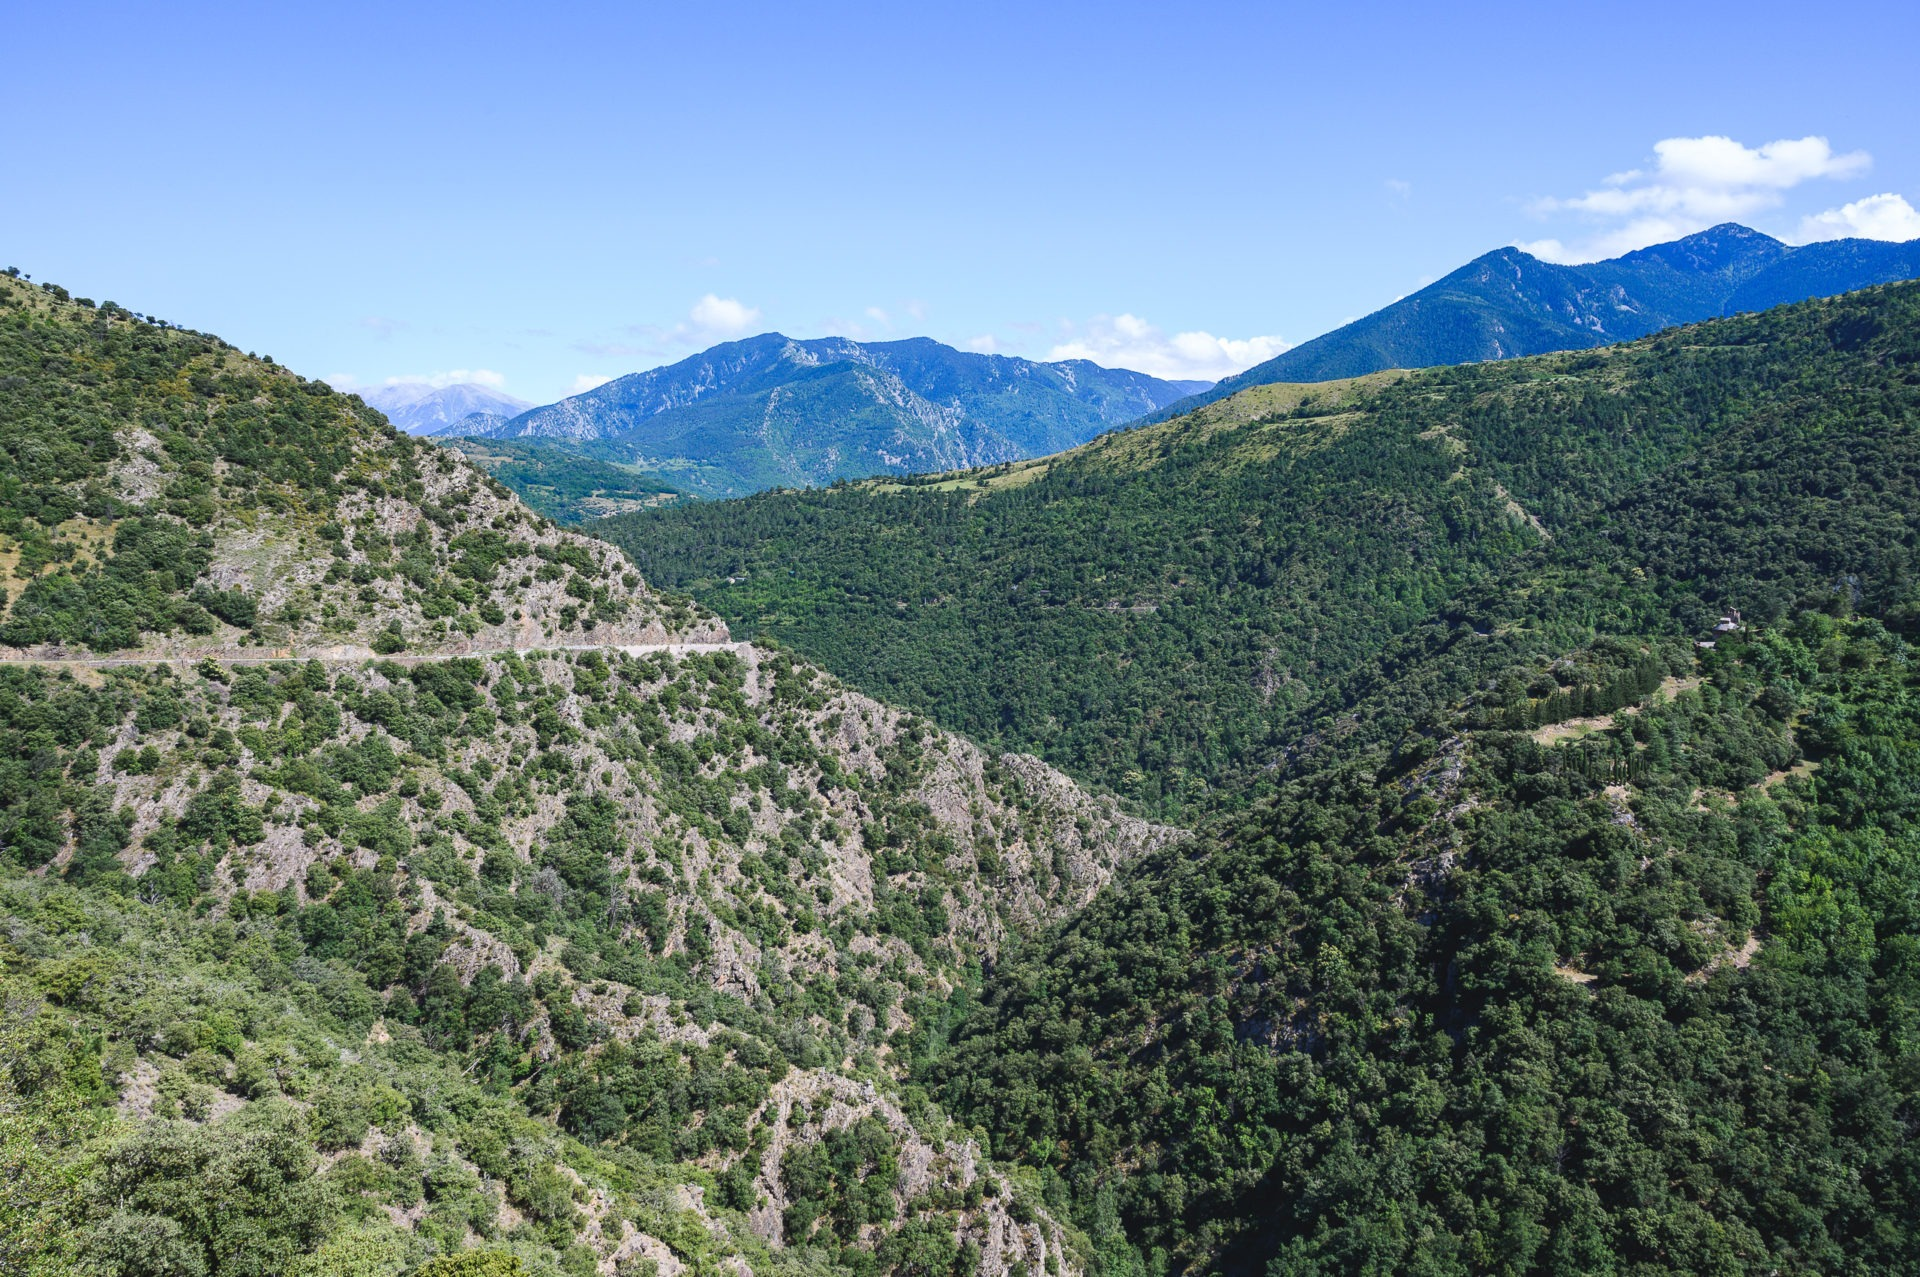 PNR pyrenees catalanes 5331